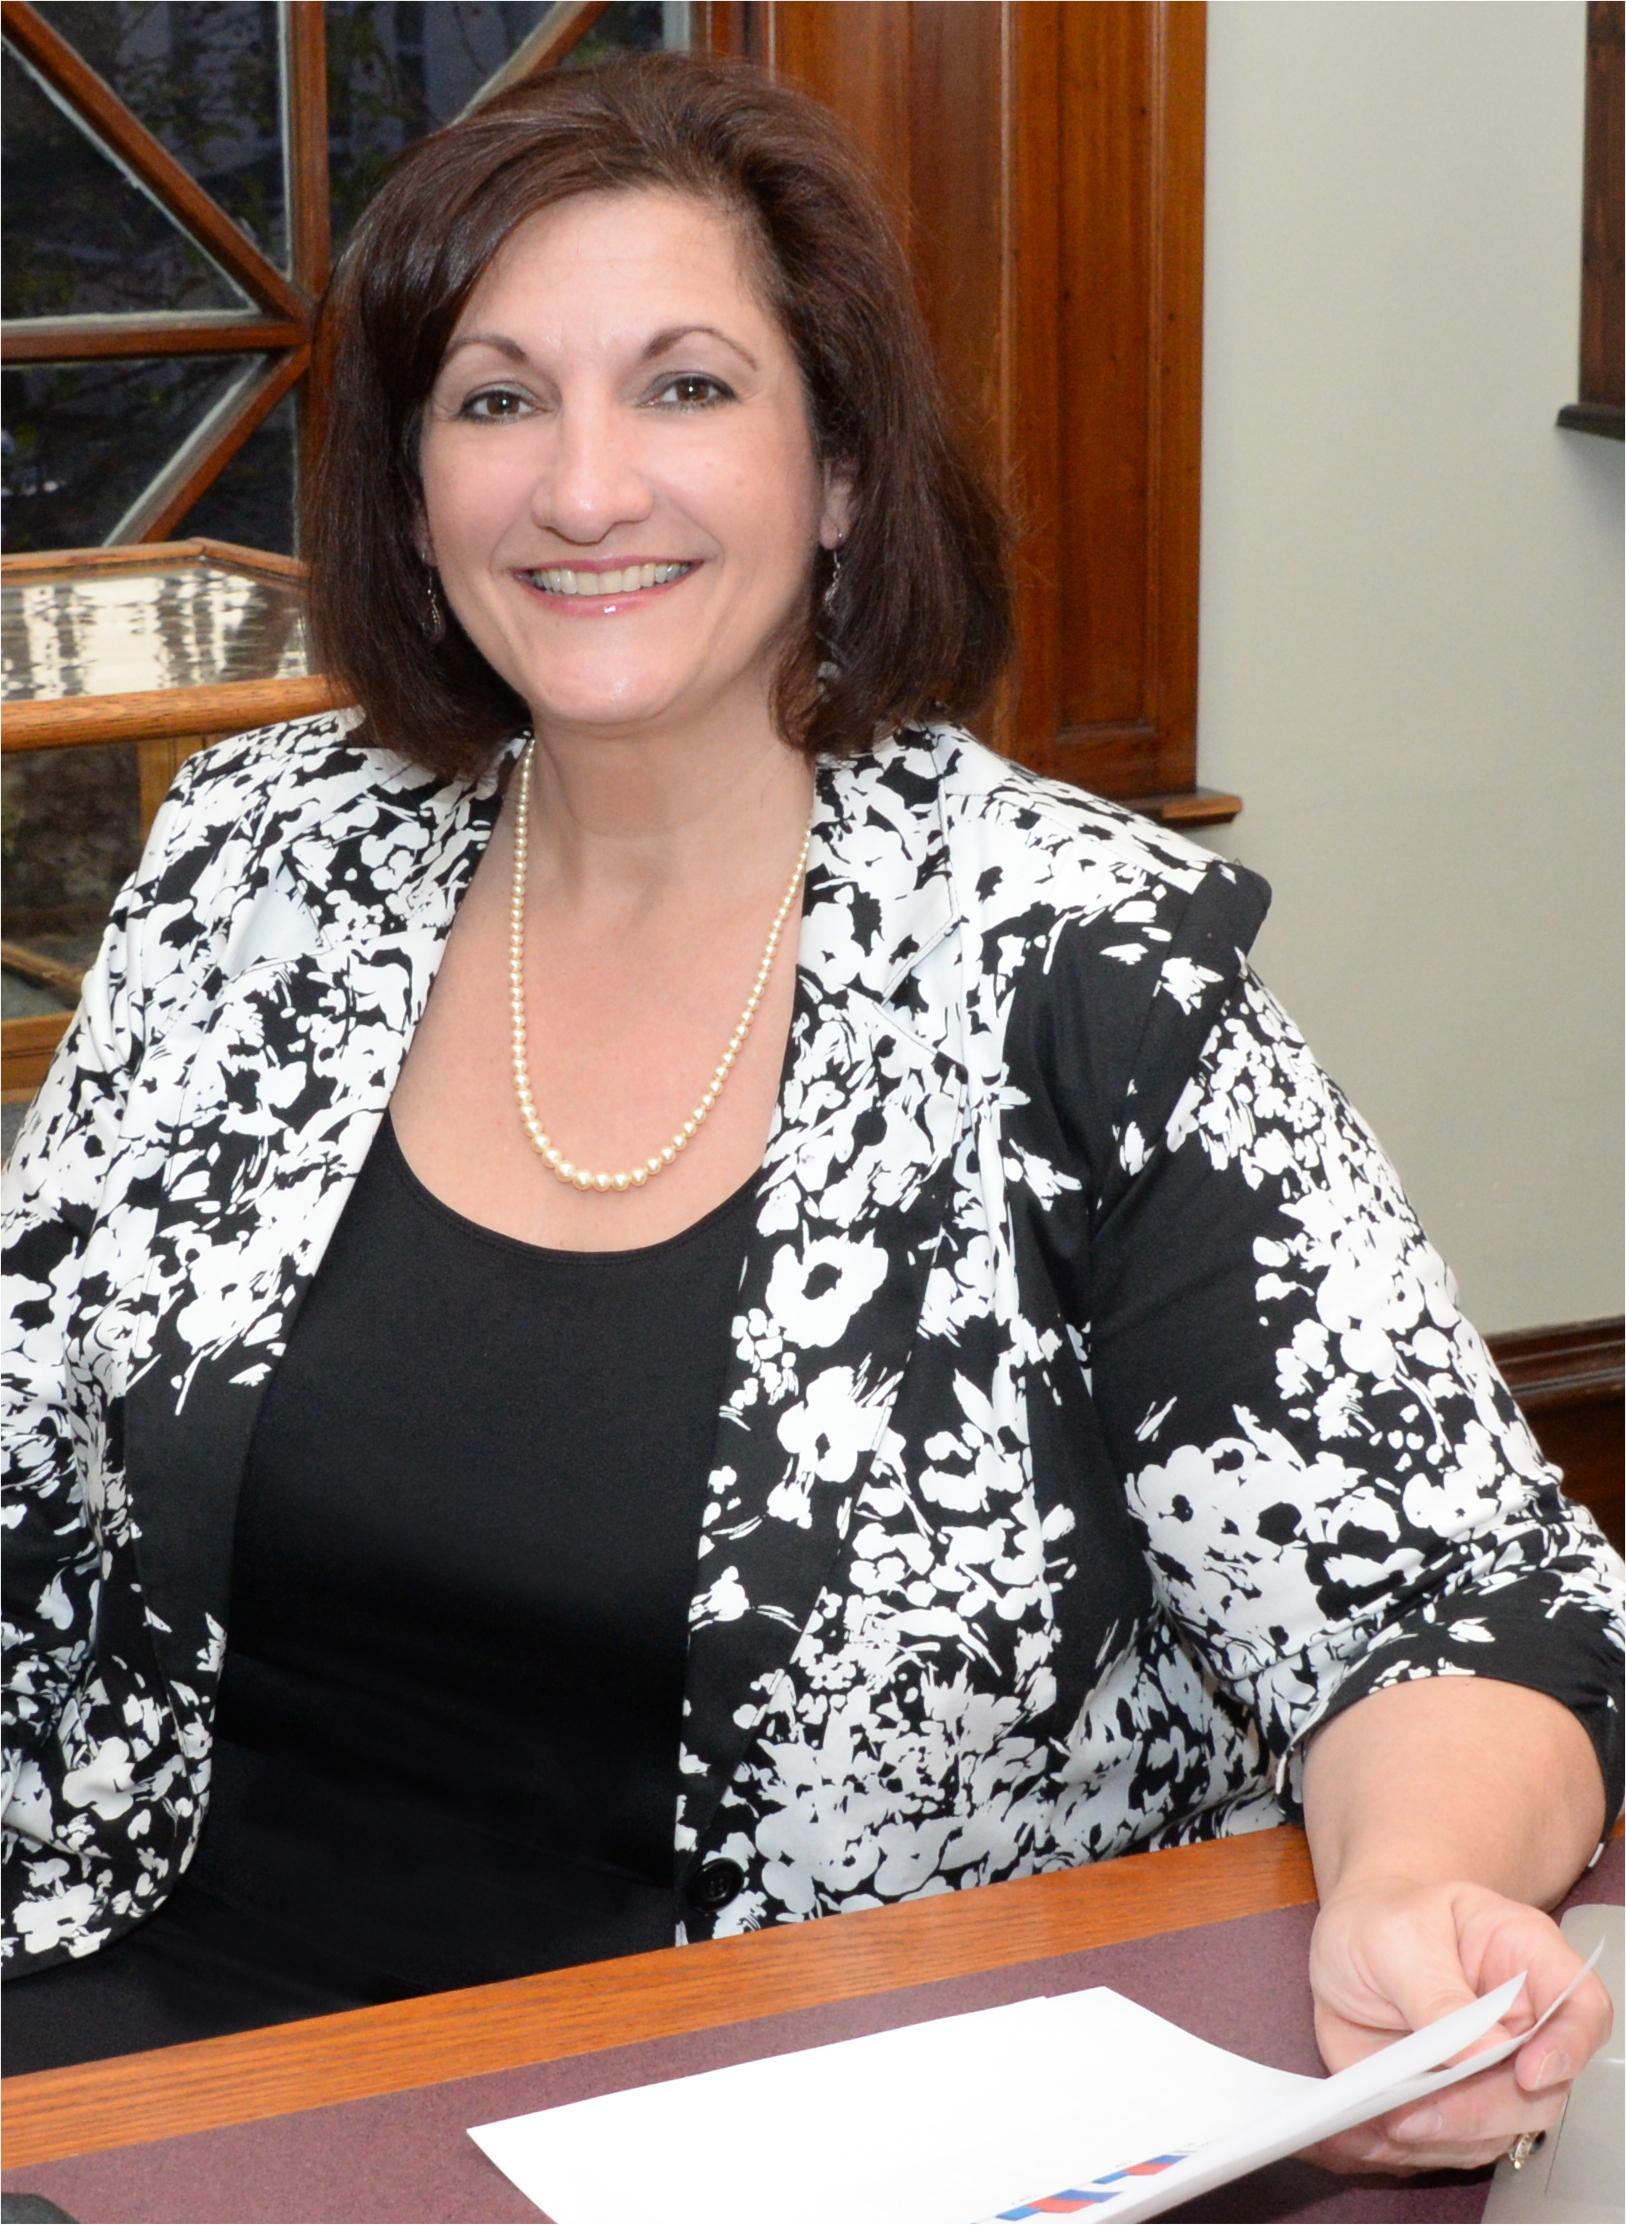 Introducing Sheri Wilson, Sanctuary Manager